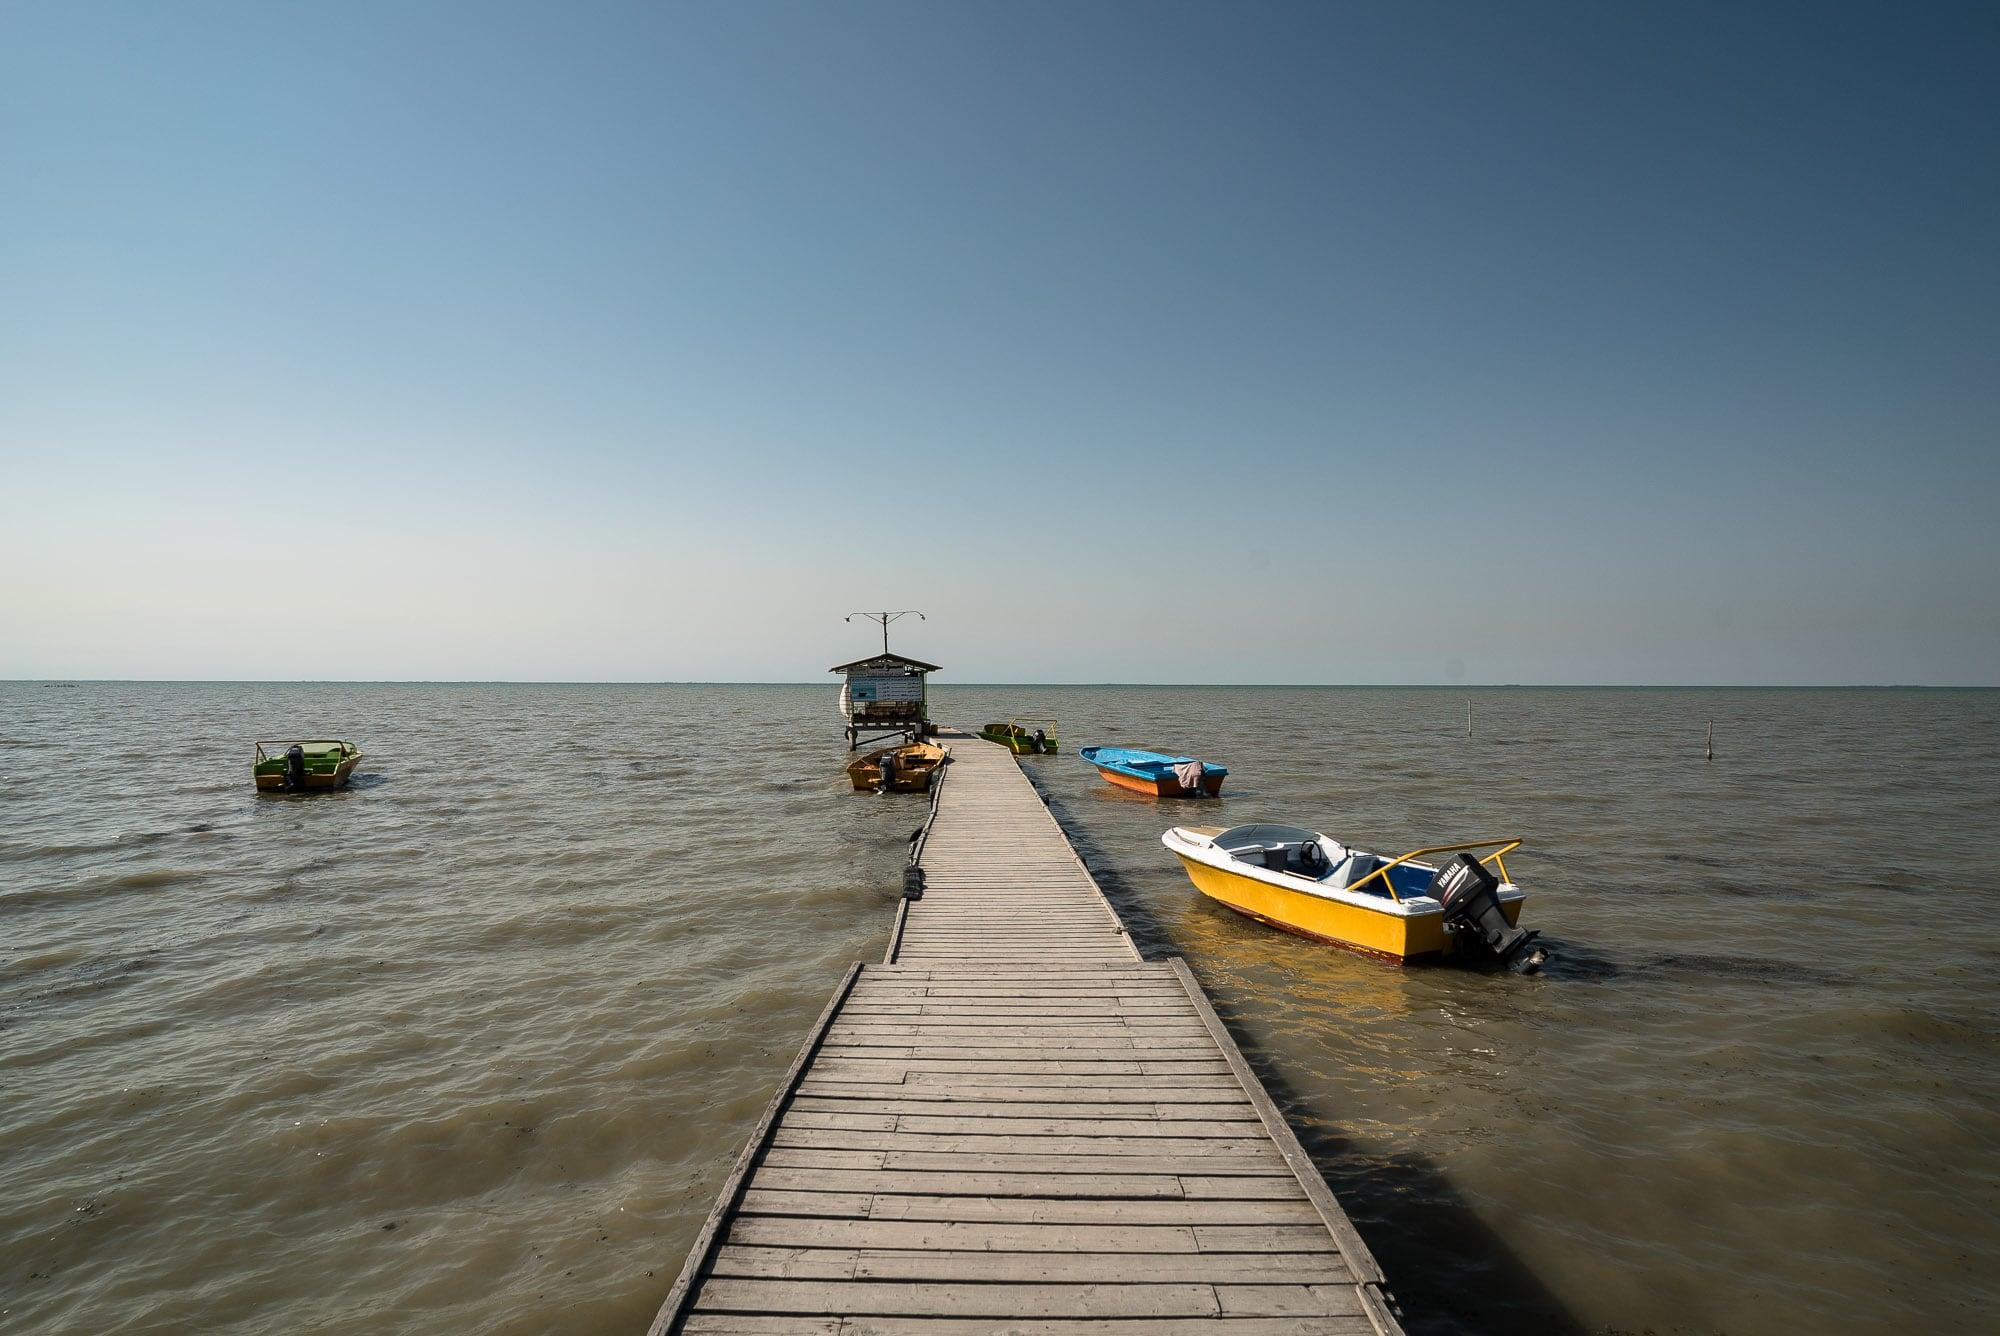 pier into the Caspian Sea